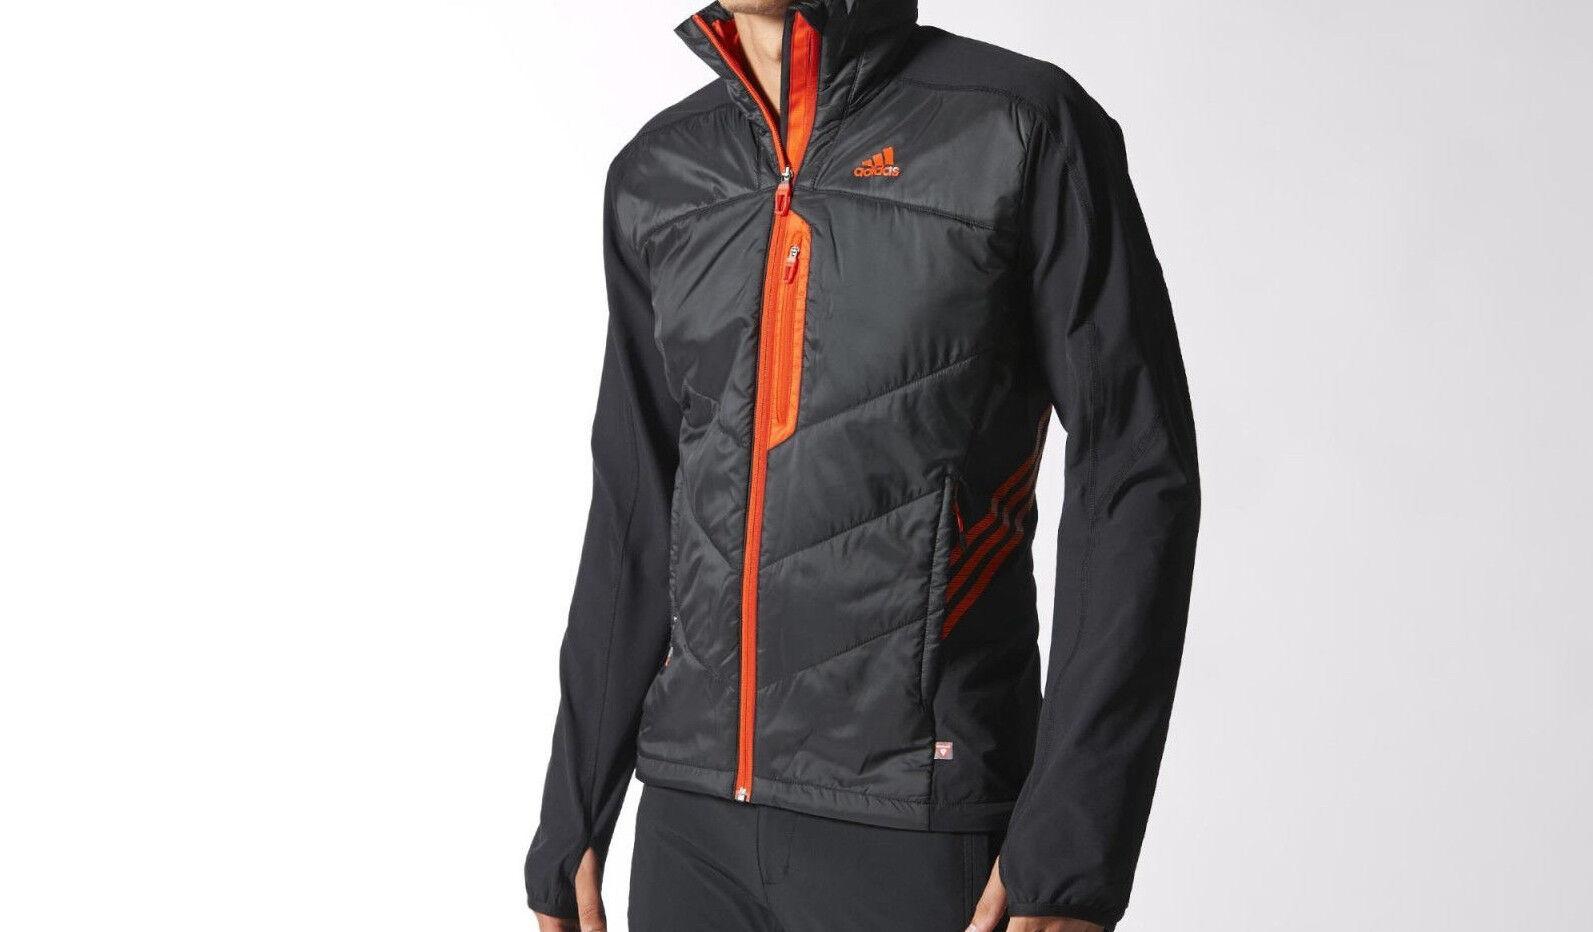 Adidas Outdoor Outdoor Outdoor Jacke Terrex Skyclimb Insulation 2 Größe 50 schwarz NEU 65a82b